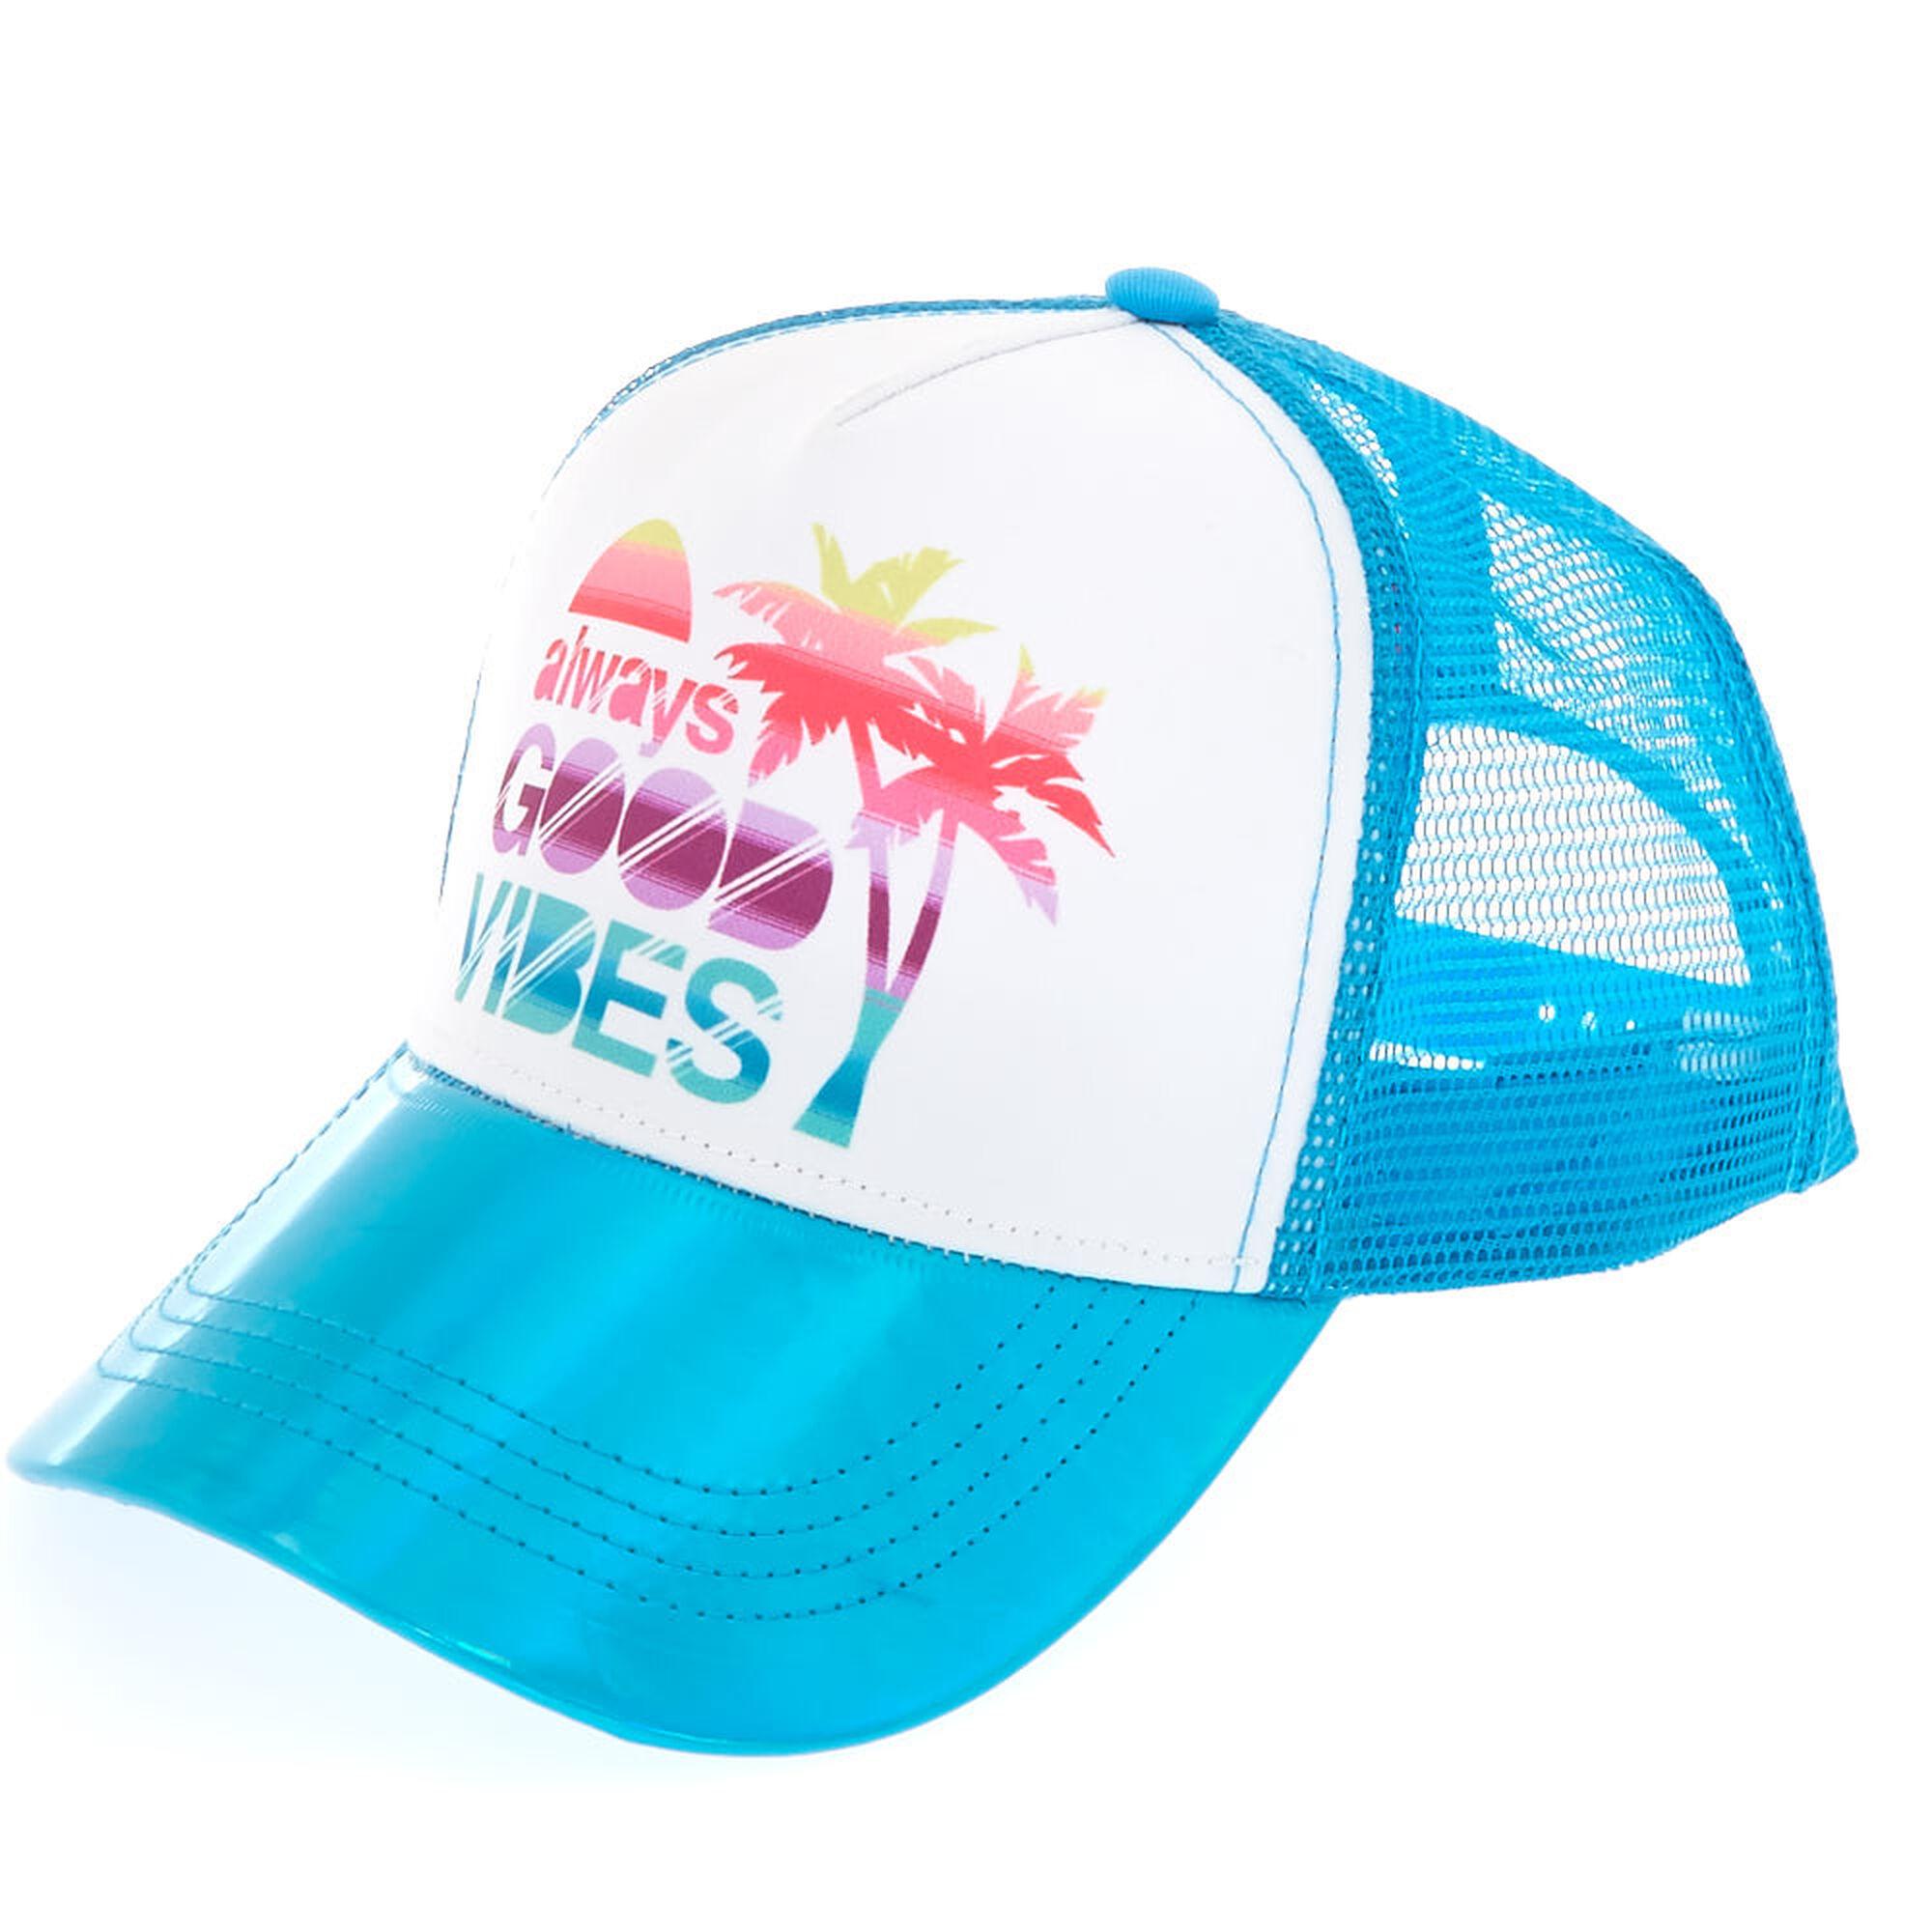 1c39d153a30 Baseball Cap Holders Australia